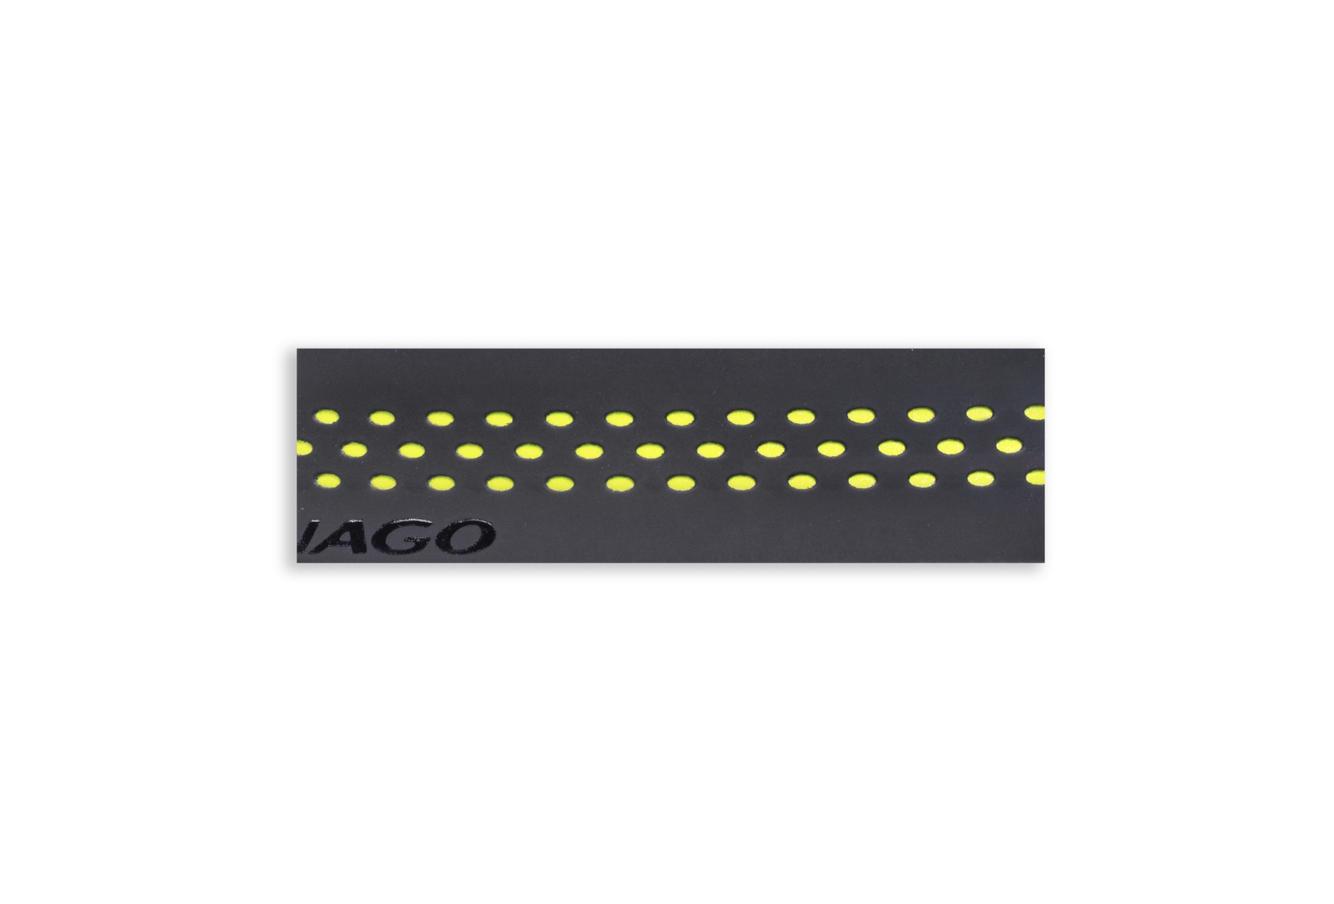 Red Black New Colnago Dot Road Bike Handlebar Tape